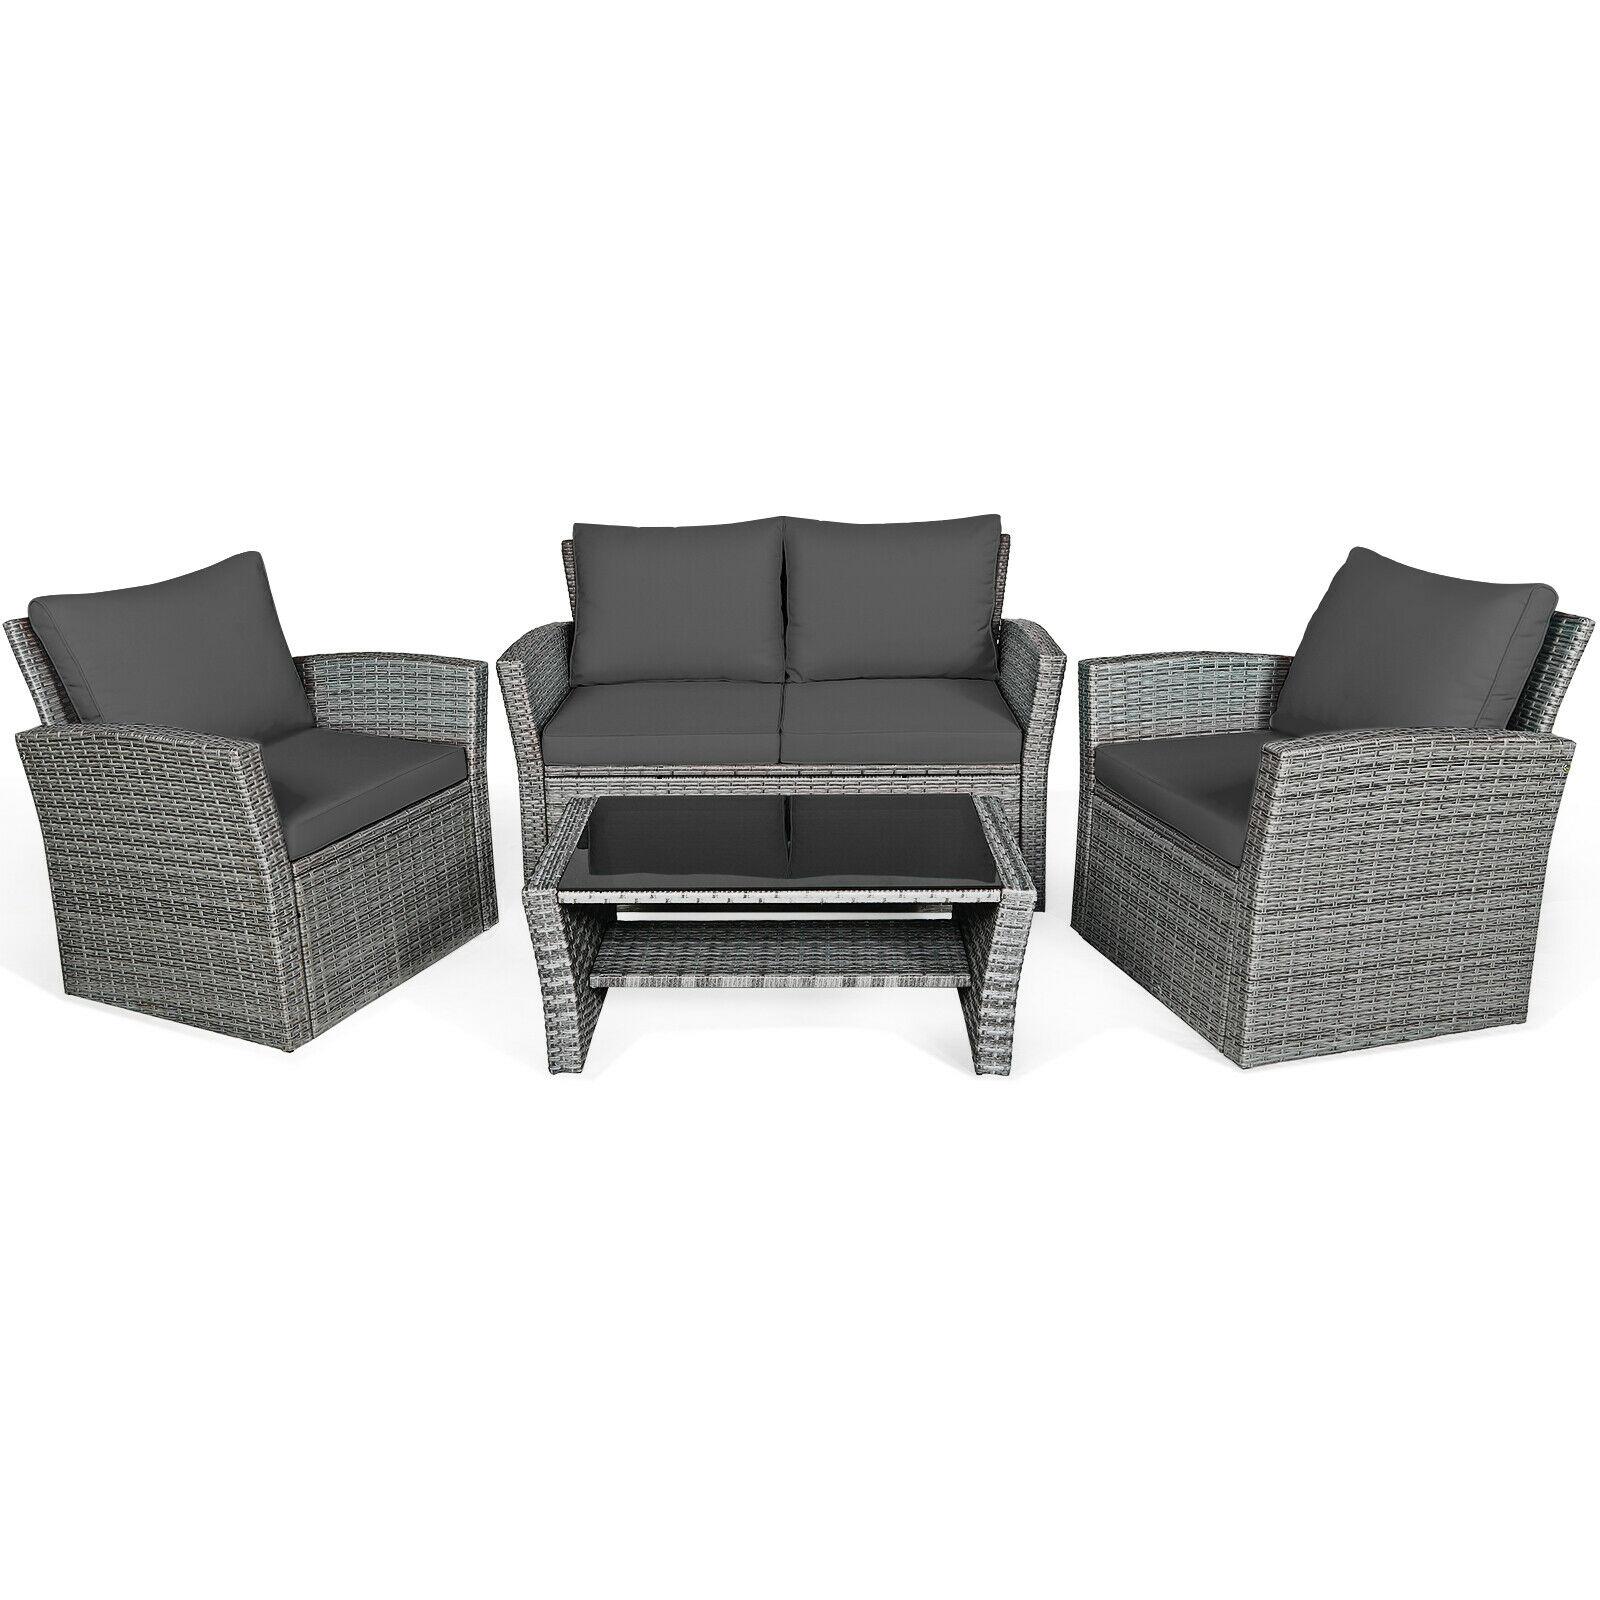 4PCS Patio Rattan Furniture Set Sofa Table W/Storage Shelf Turquoise/Red/Gray